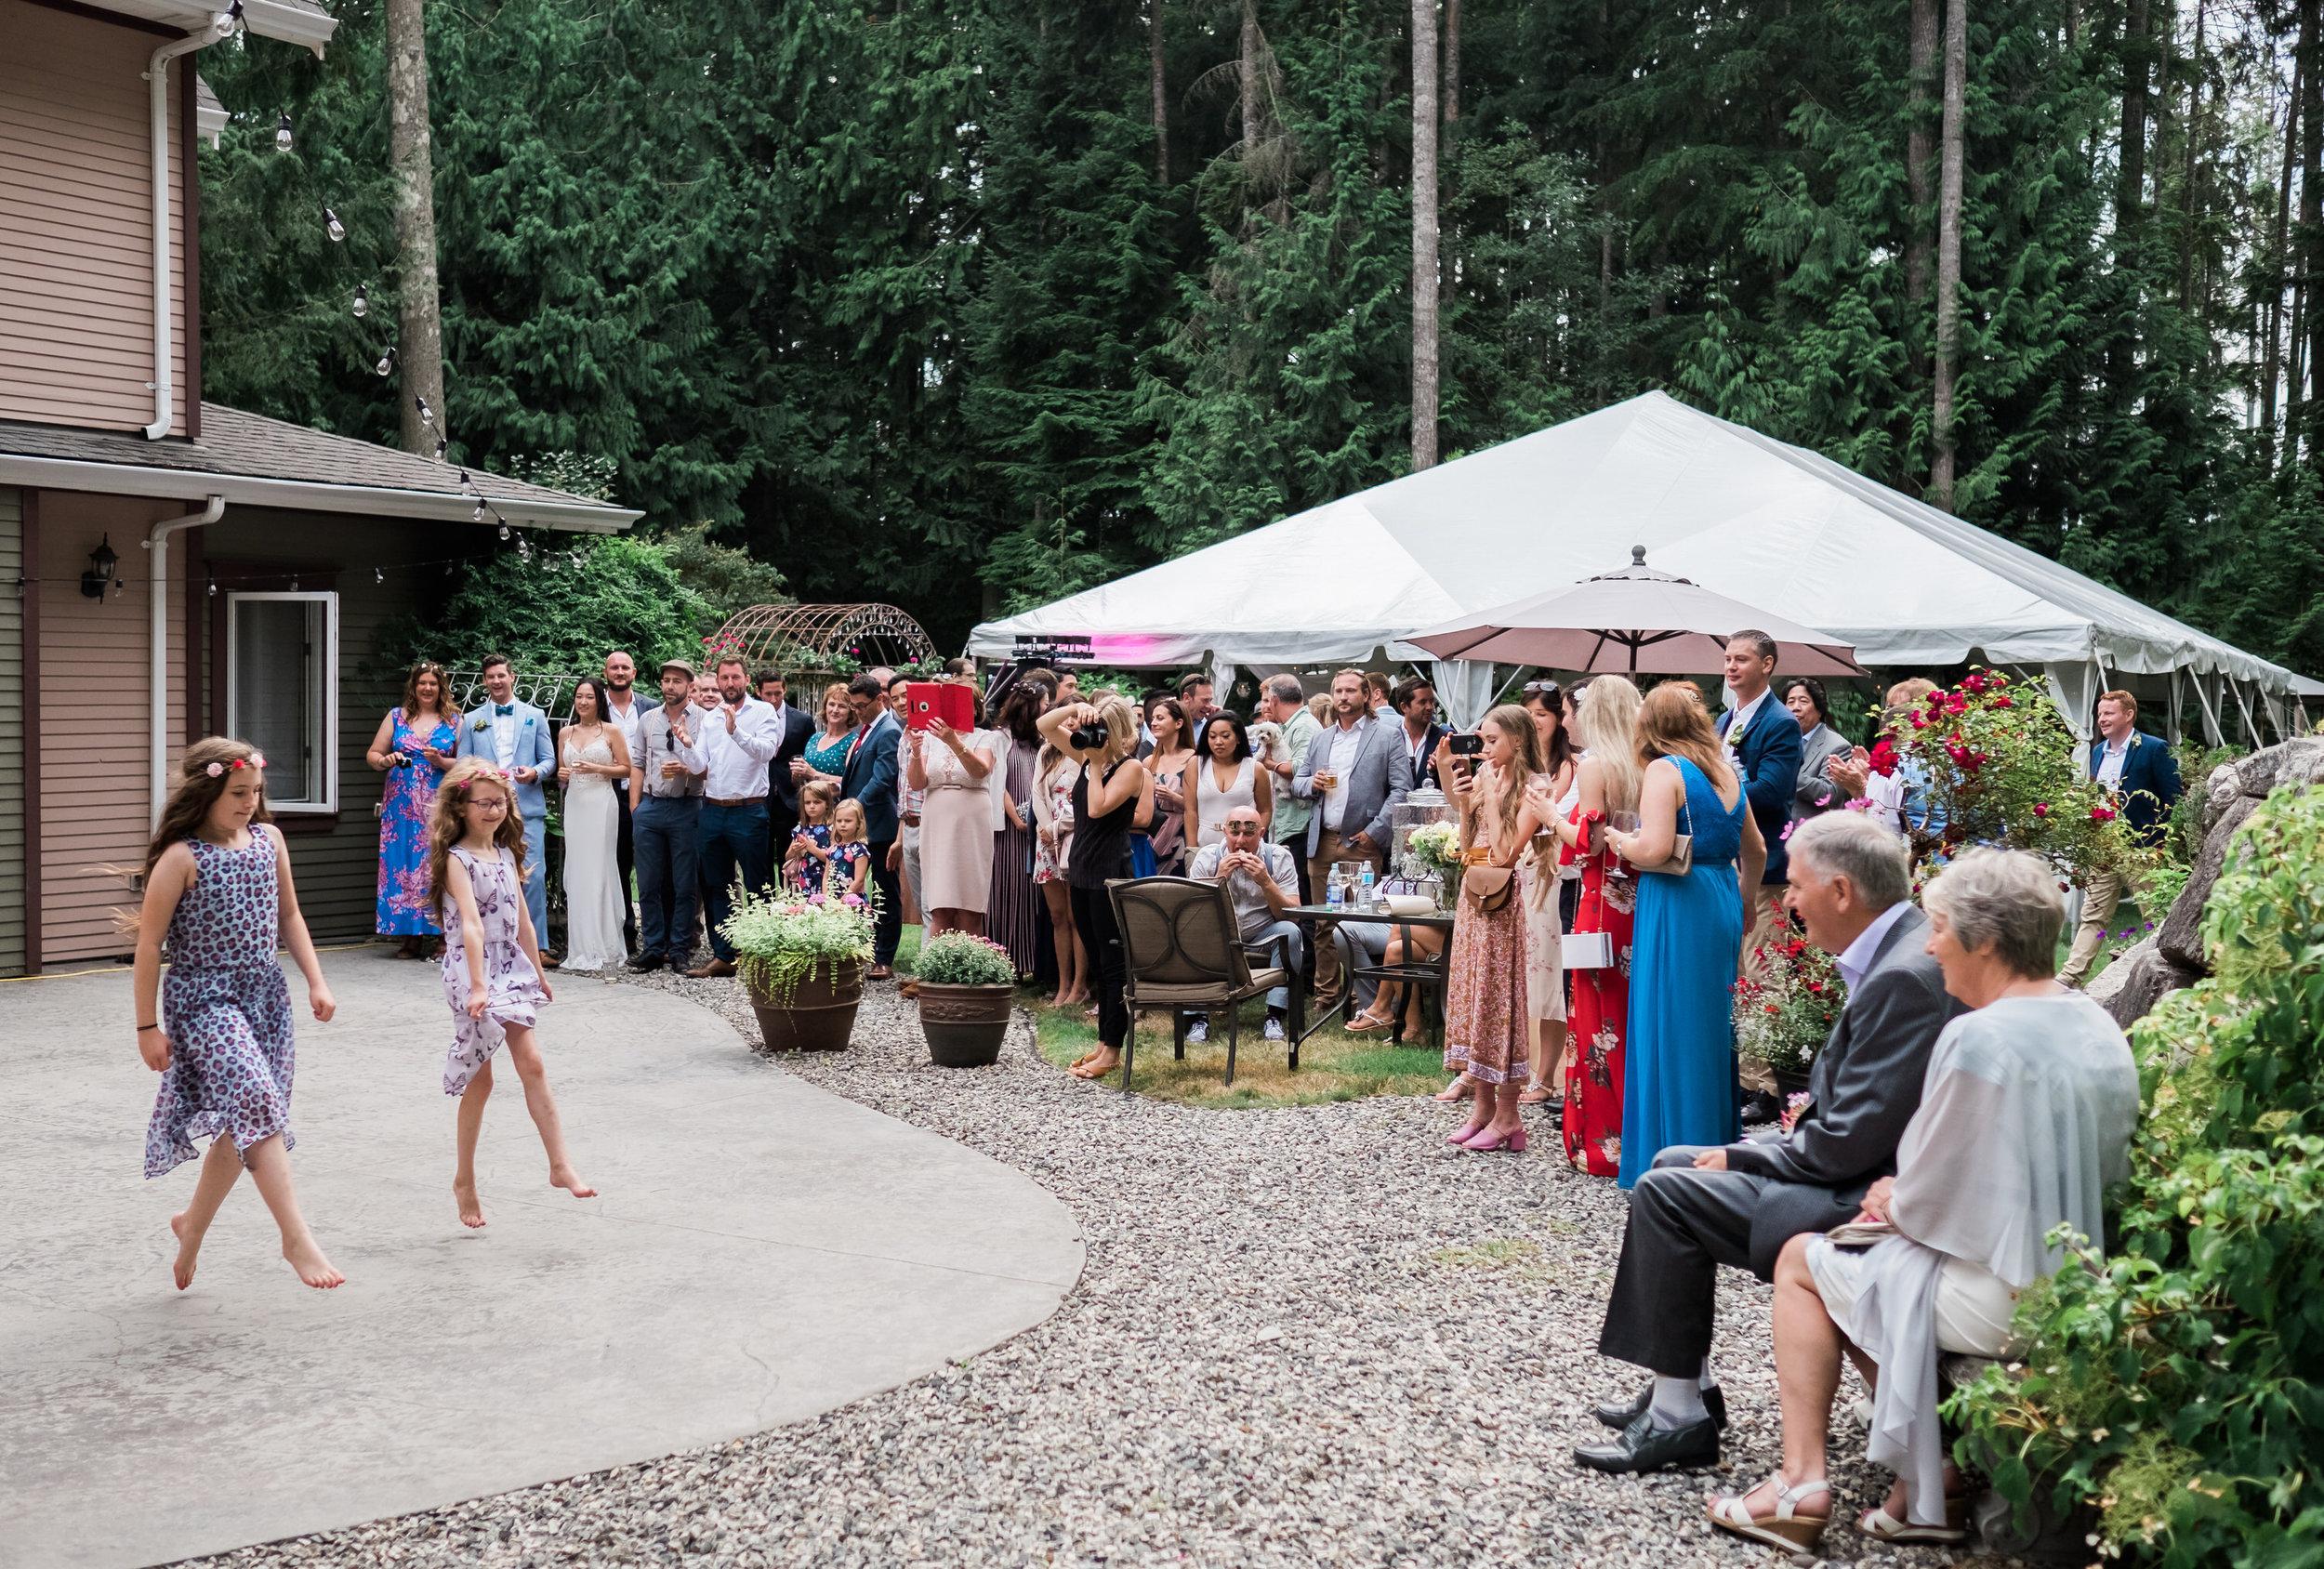 Linwood House Wedding Photos - Roberts Creek Wedding Photos - Vancouver Wedding Photographer & Videographer - Sunshine Coast Wedding Photos - Sunshine Coast Wedding Photographer - Jennifer Picard Photography - DSCF0100.jpg